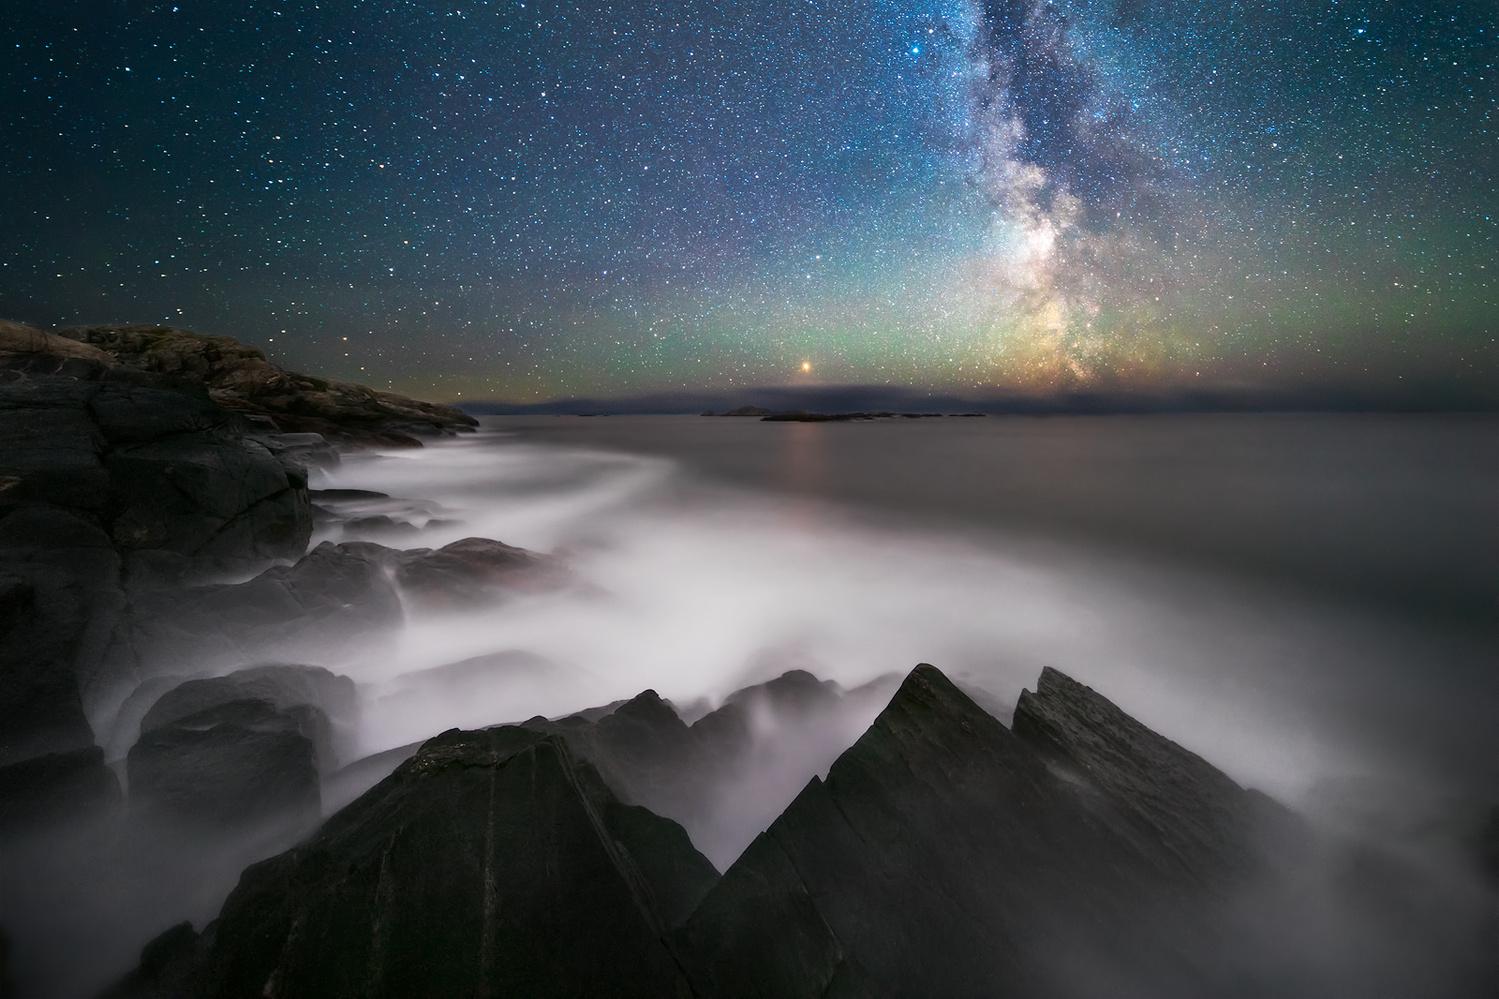 Waves at night by Marcin Kowalski